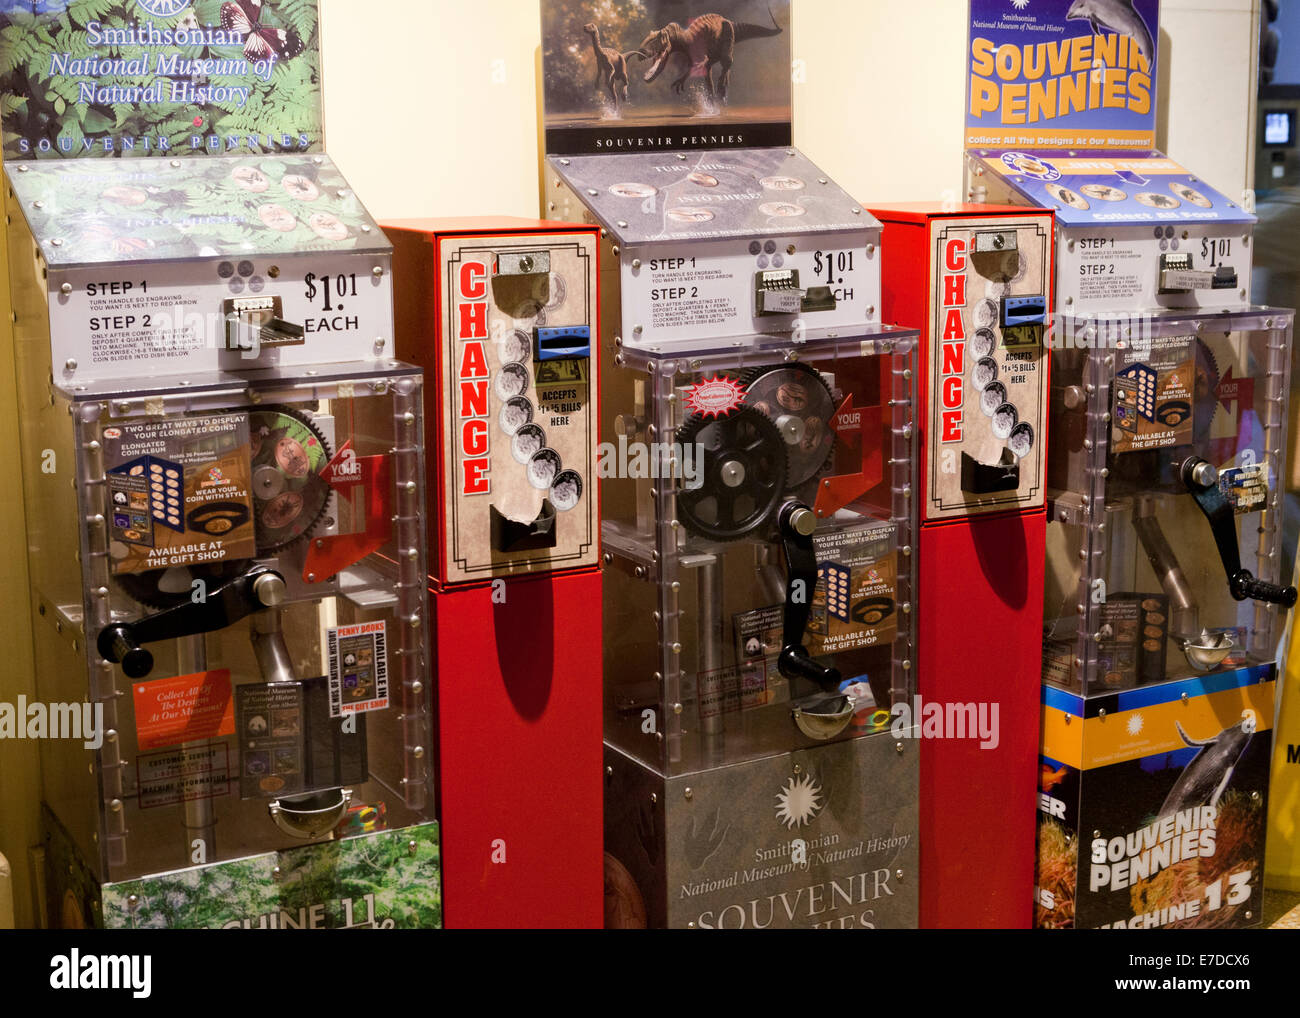 Souvenir Coin Machine Photos Souvenir Coin Machine Images Alamy